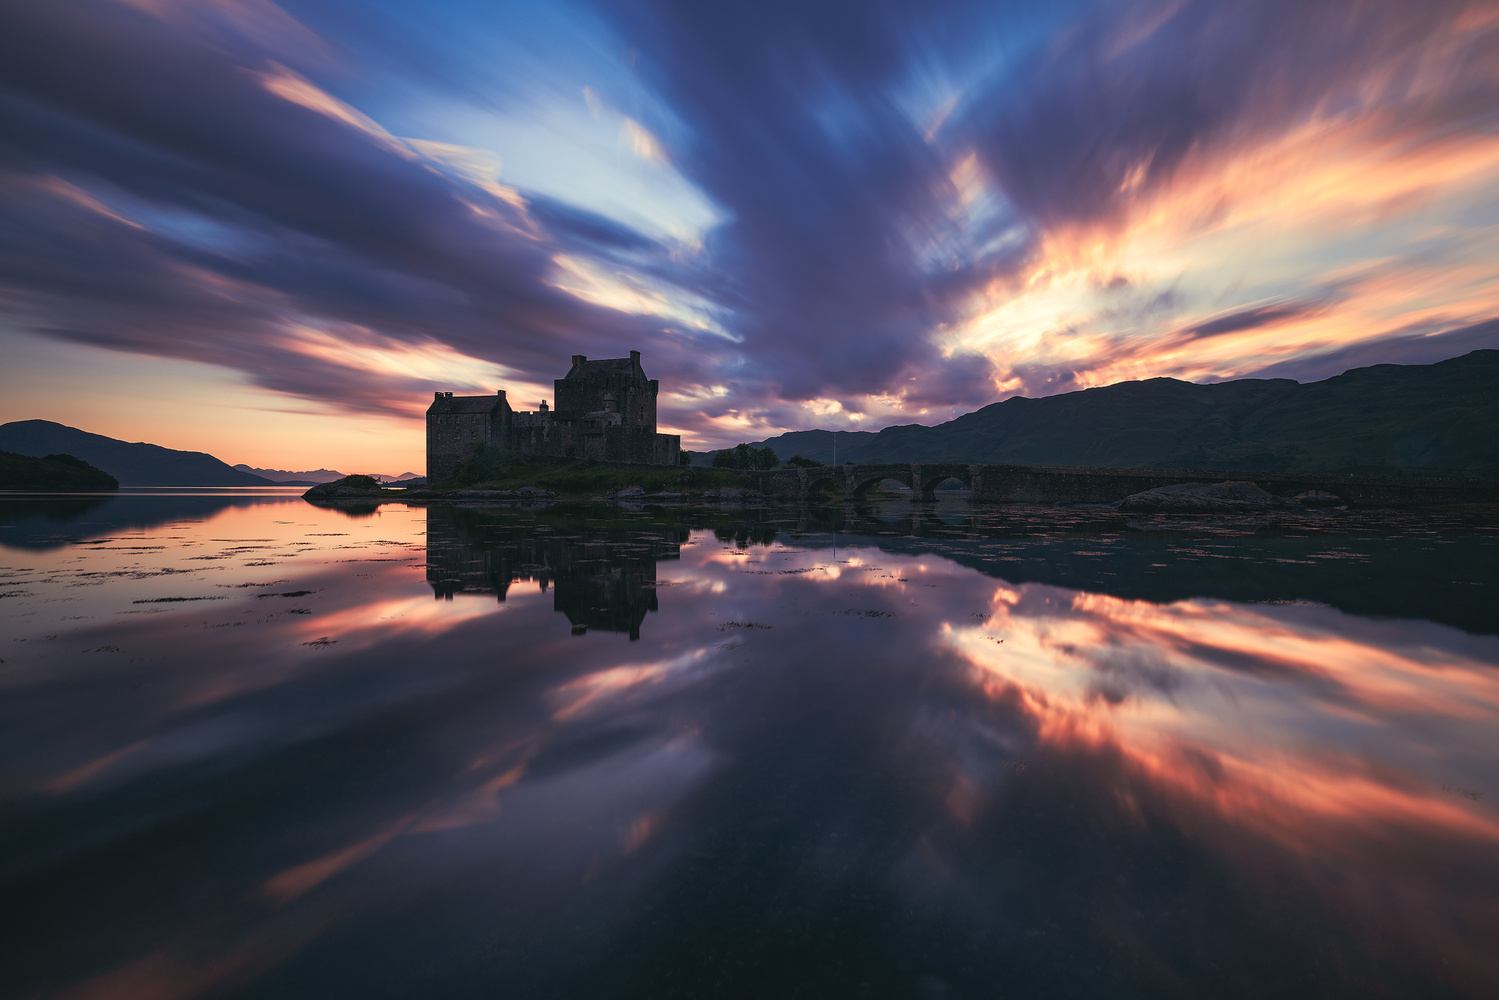 Scotland - Eilean Donan Castle by Jean Claude Castor